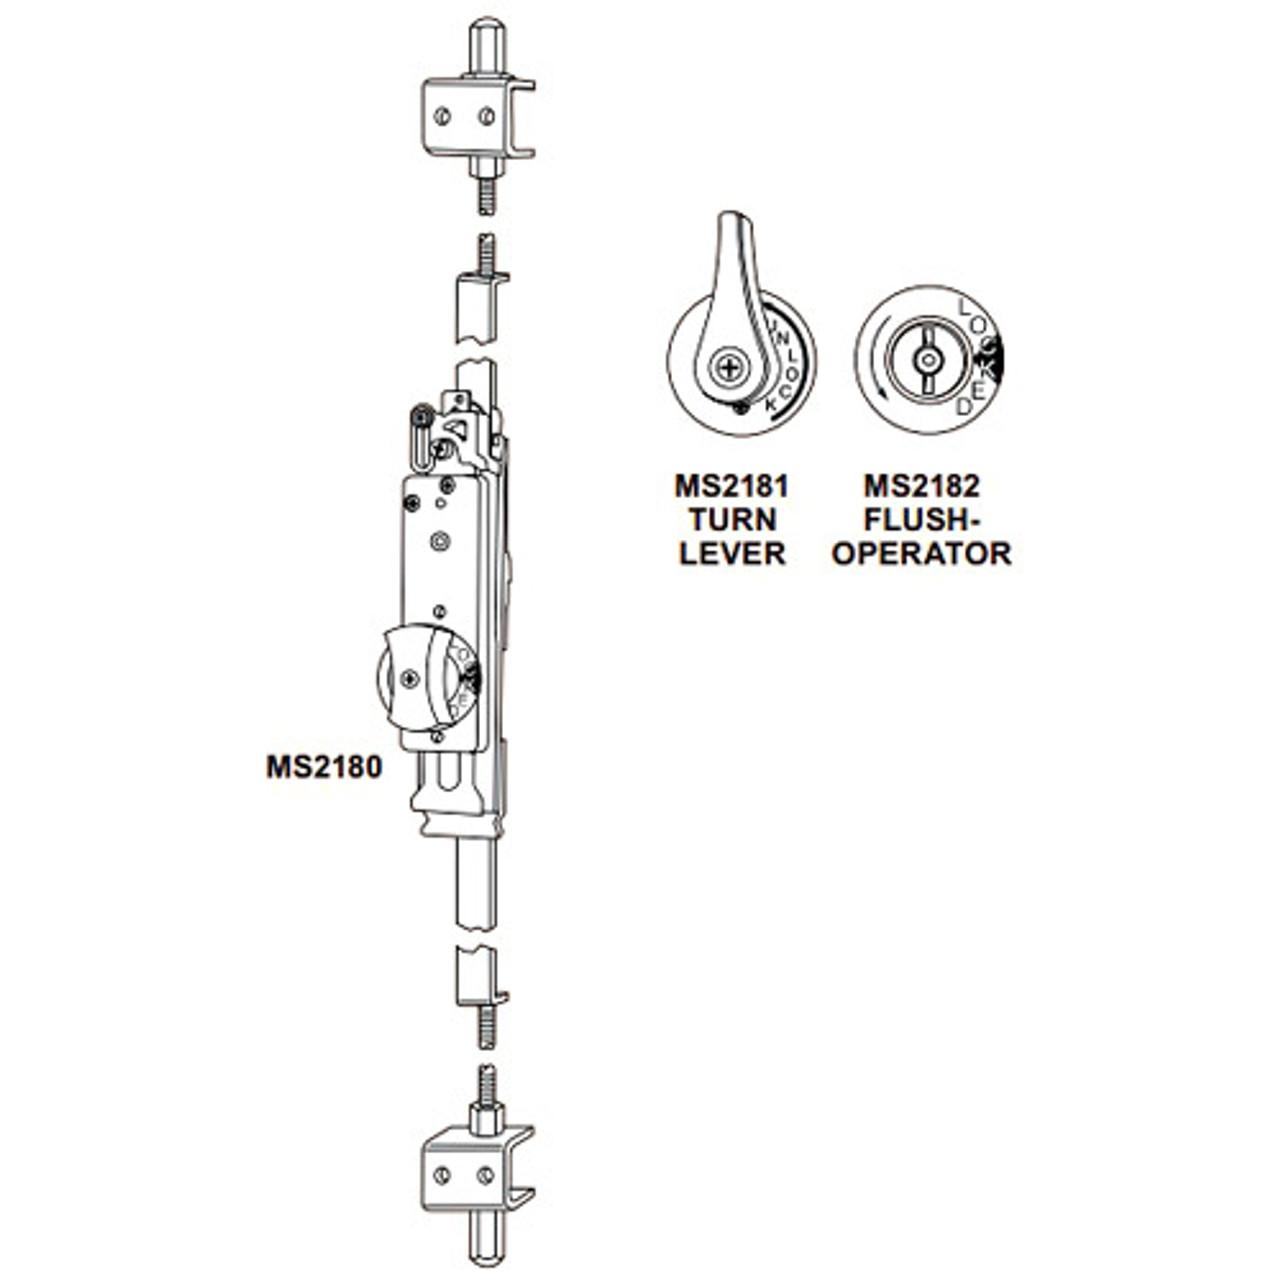 MS2182-10-130 Adams Rite Flushbolt in Clear Anodized Finish